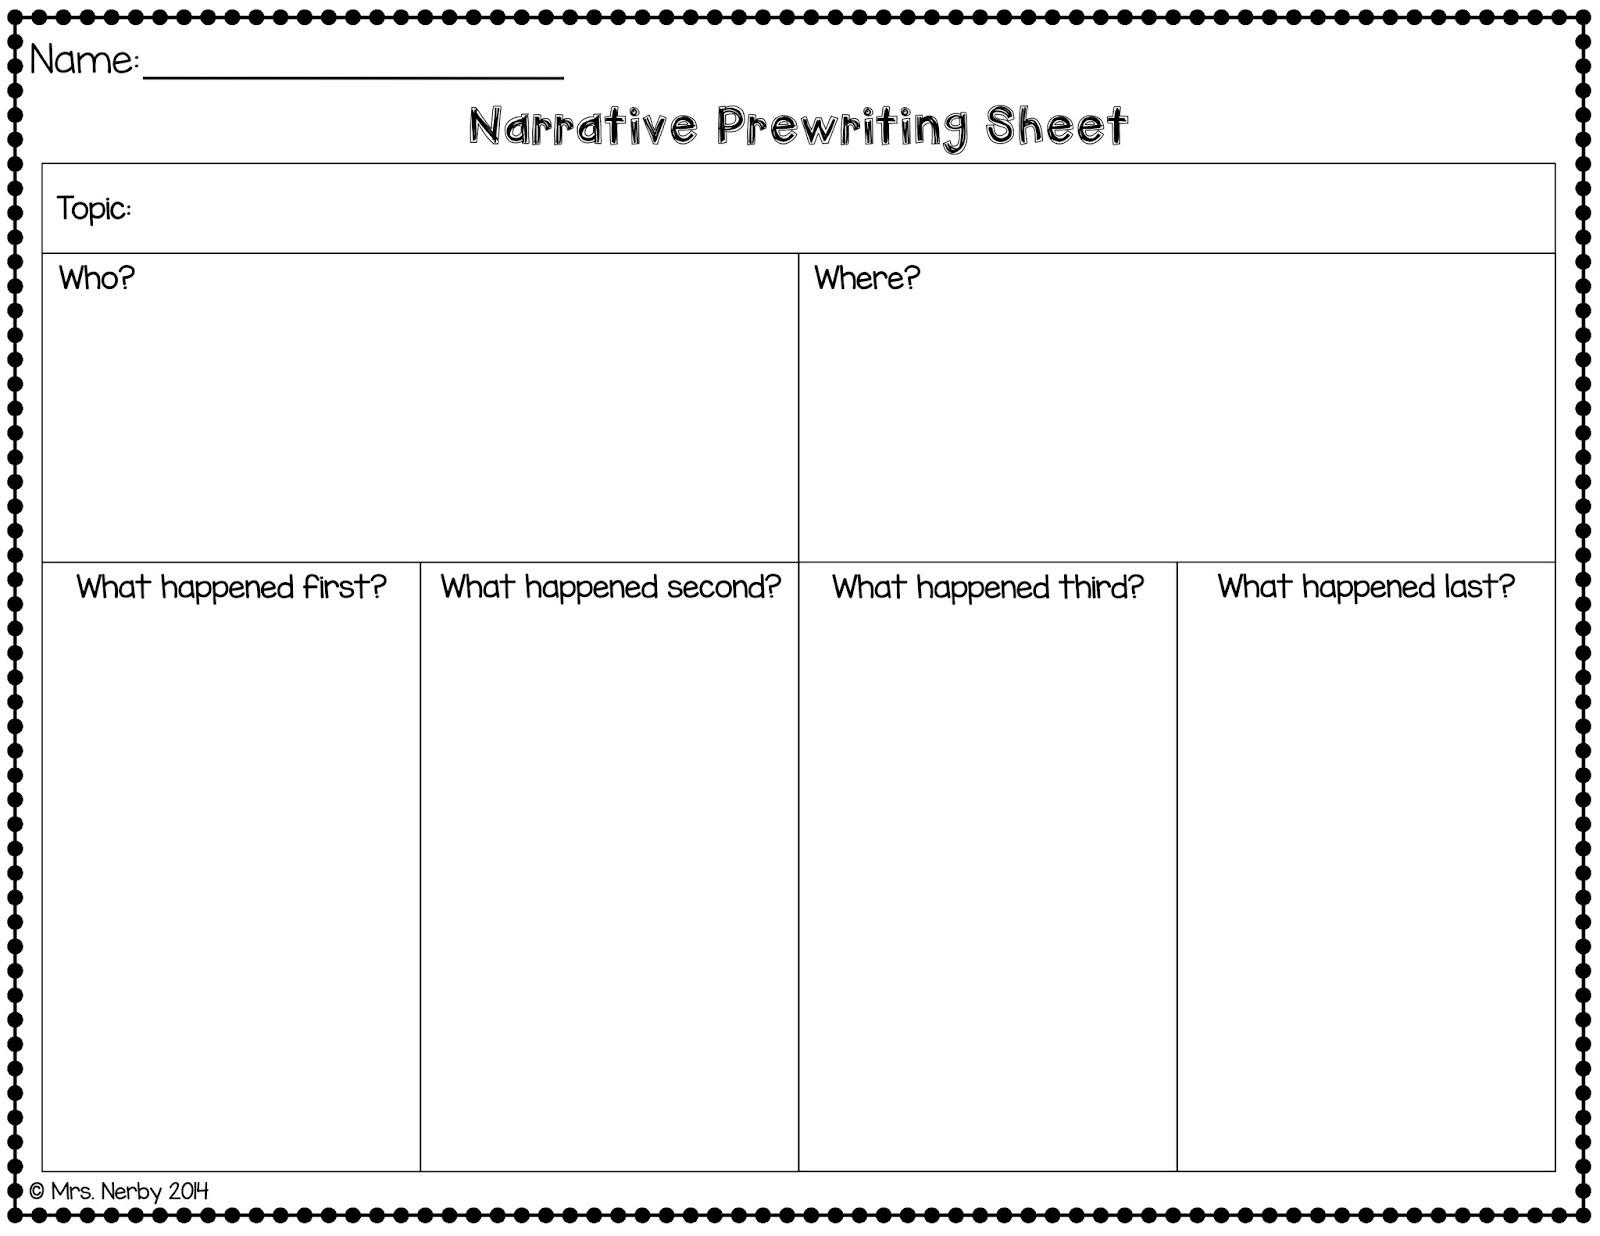 007 Narrative Essay Graphic Organizer Narrative2bpw2bsheet2bpic Incredible Middle School Pdf Story Full